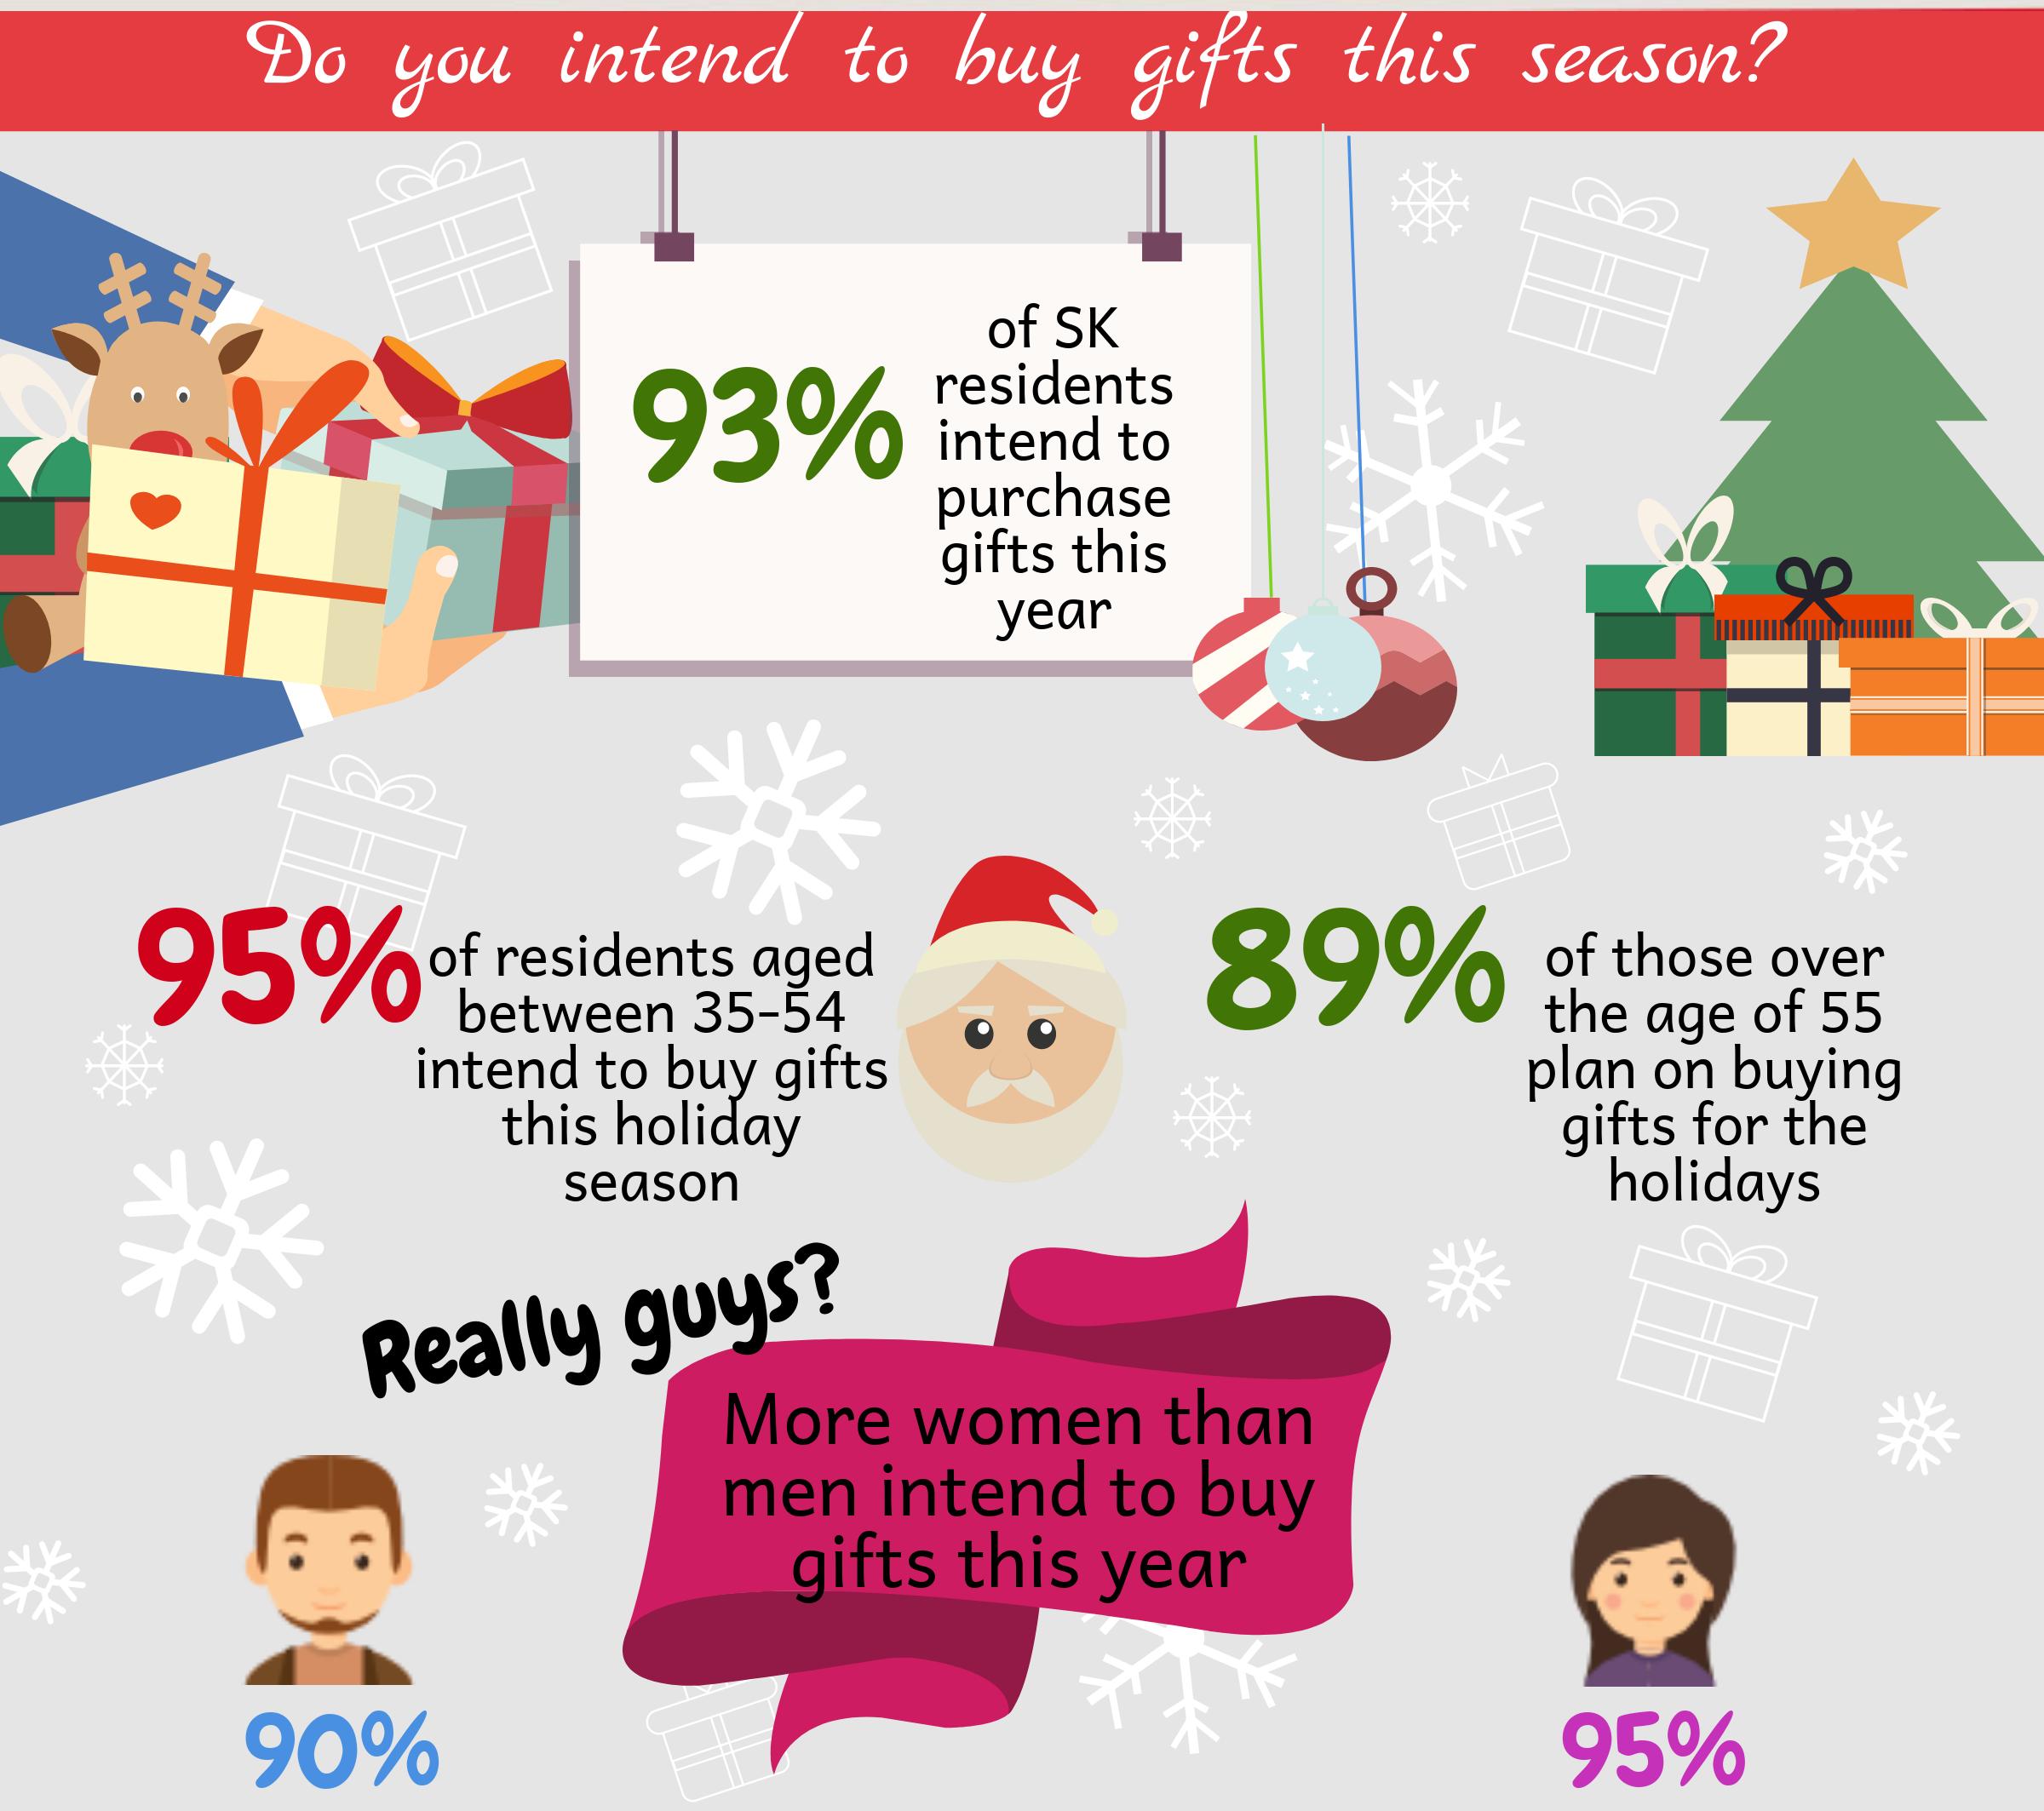 holiday shopping, insightrix, saskwatch, saskwatch research, christmas